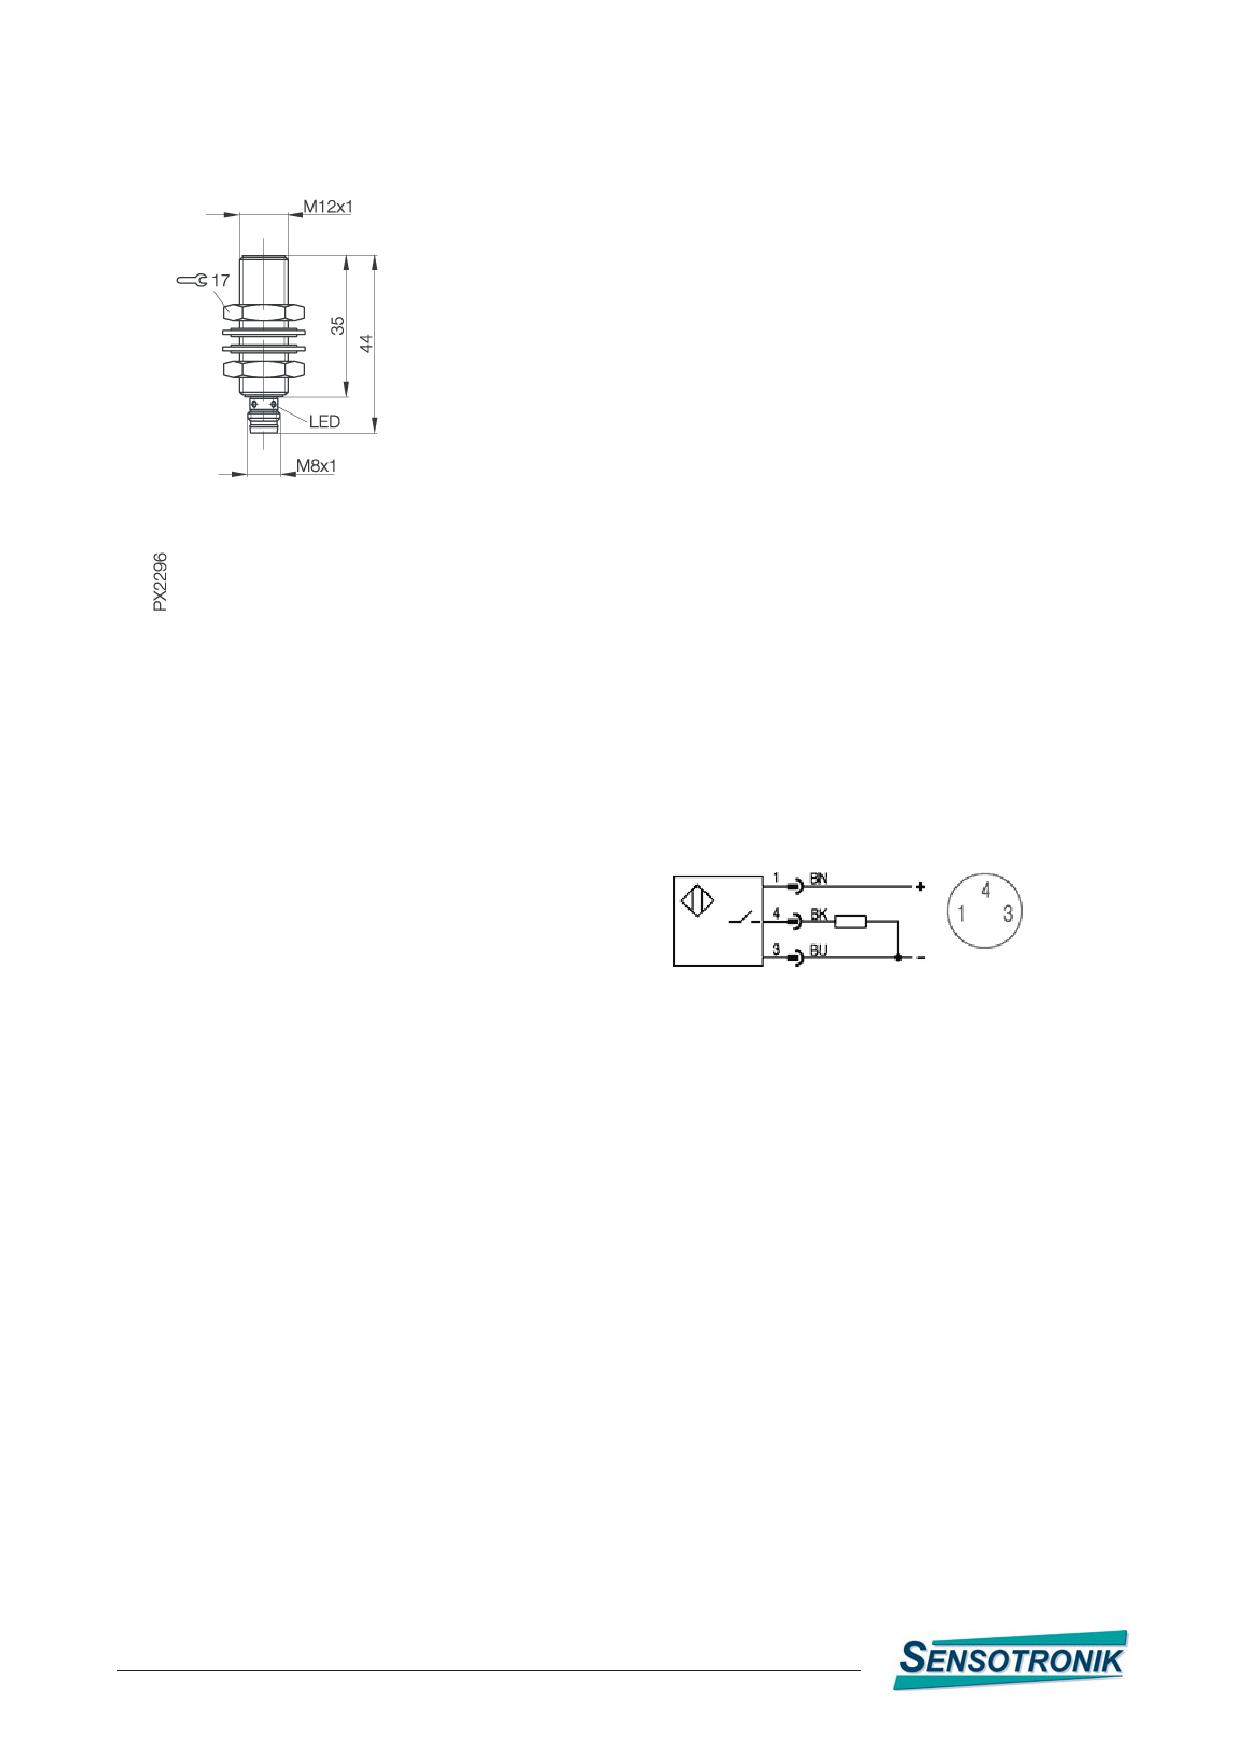 BES516-325-G-E5-C-S49 Даташит, Описание, Даташиты